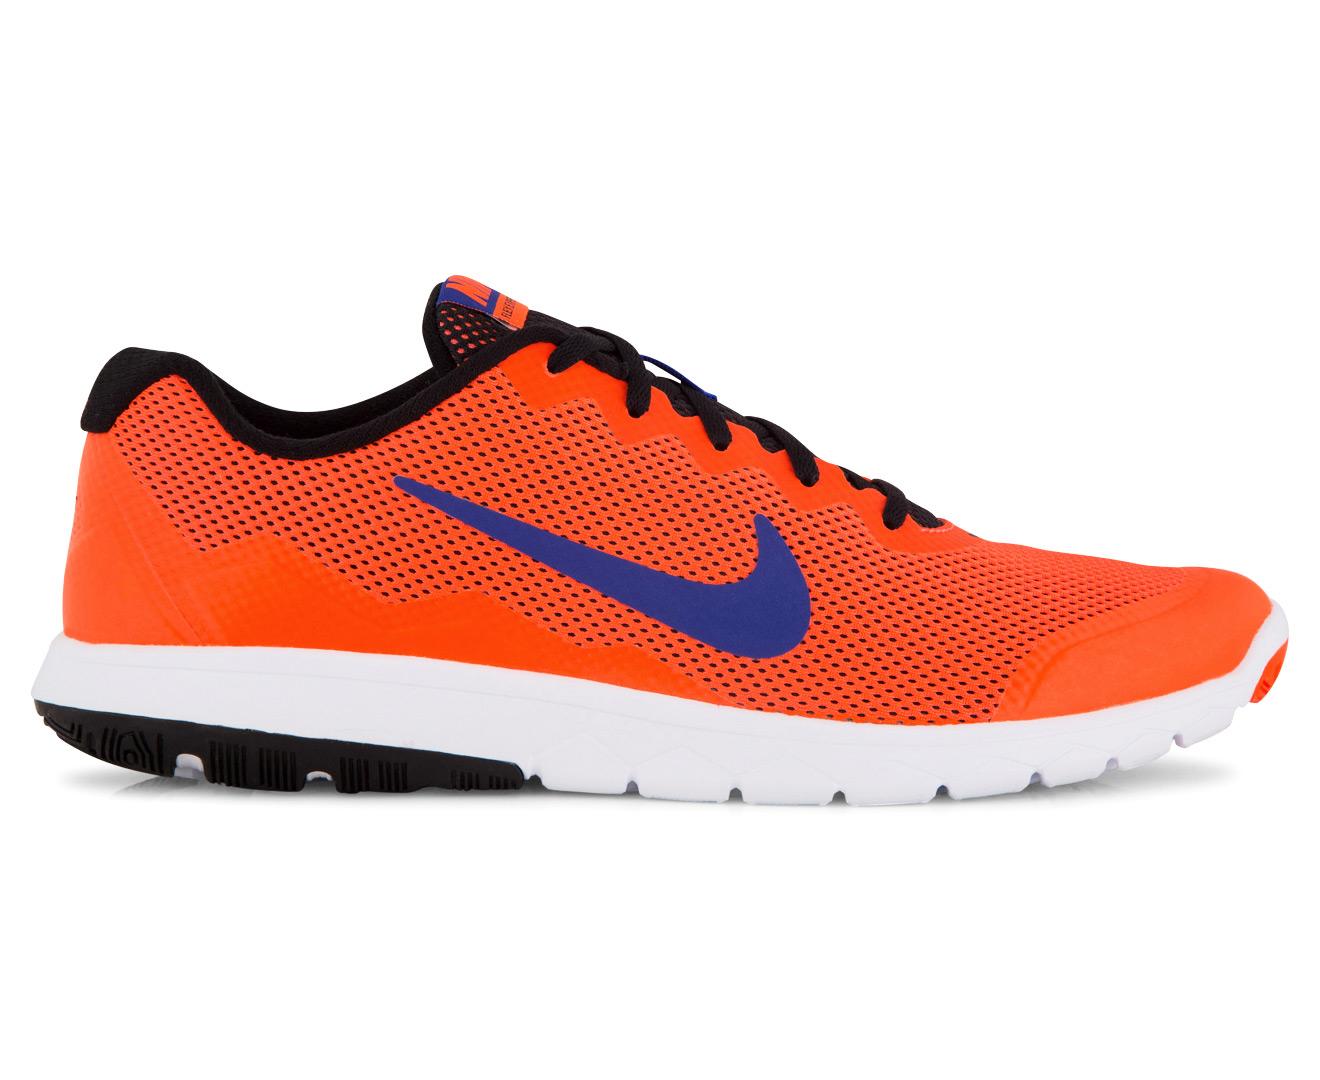 a09e147a2de3 Nike Men s Flex Experience RN4 Shoe - Total Crimson Concord Black-White